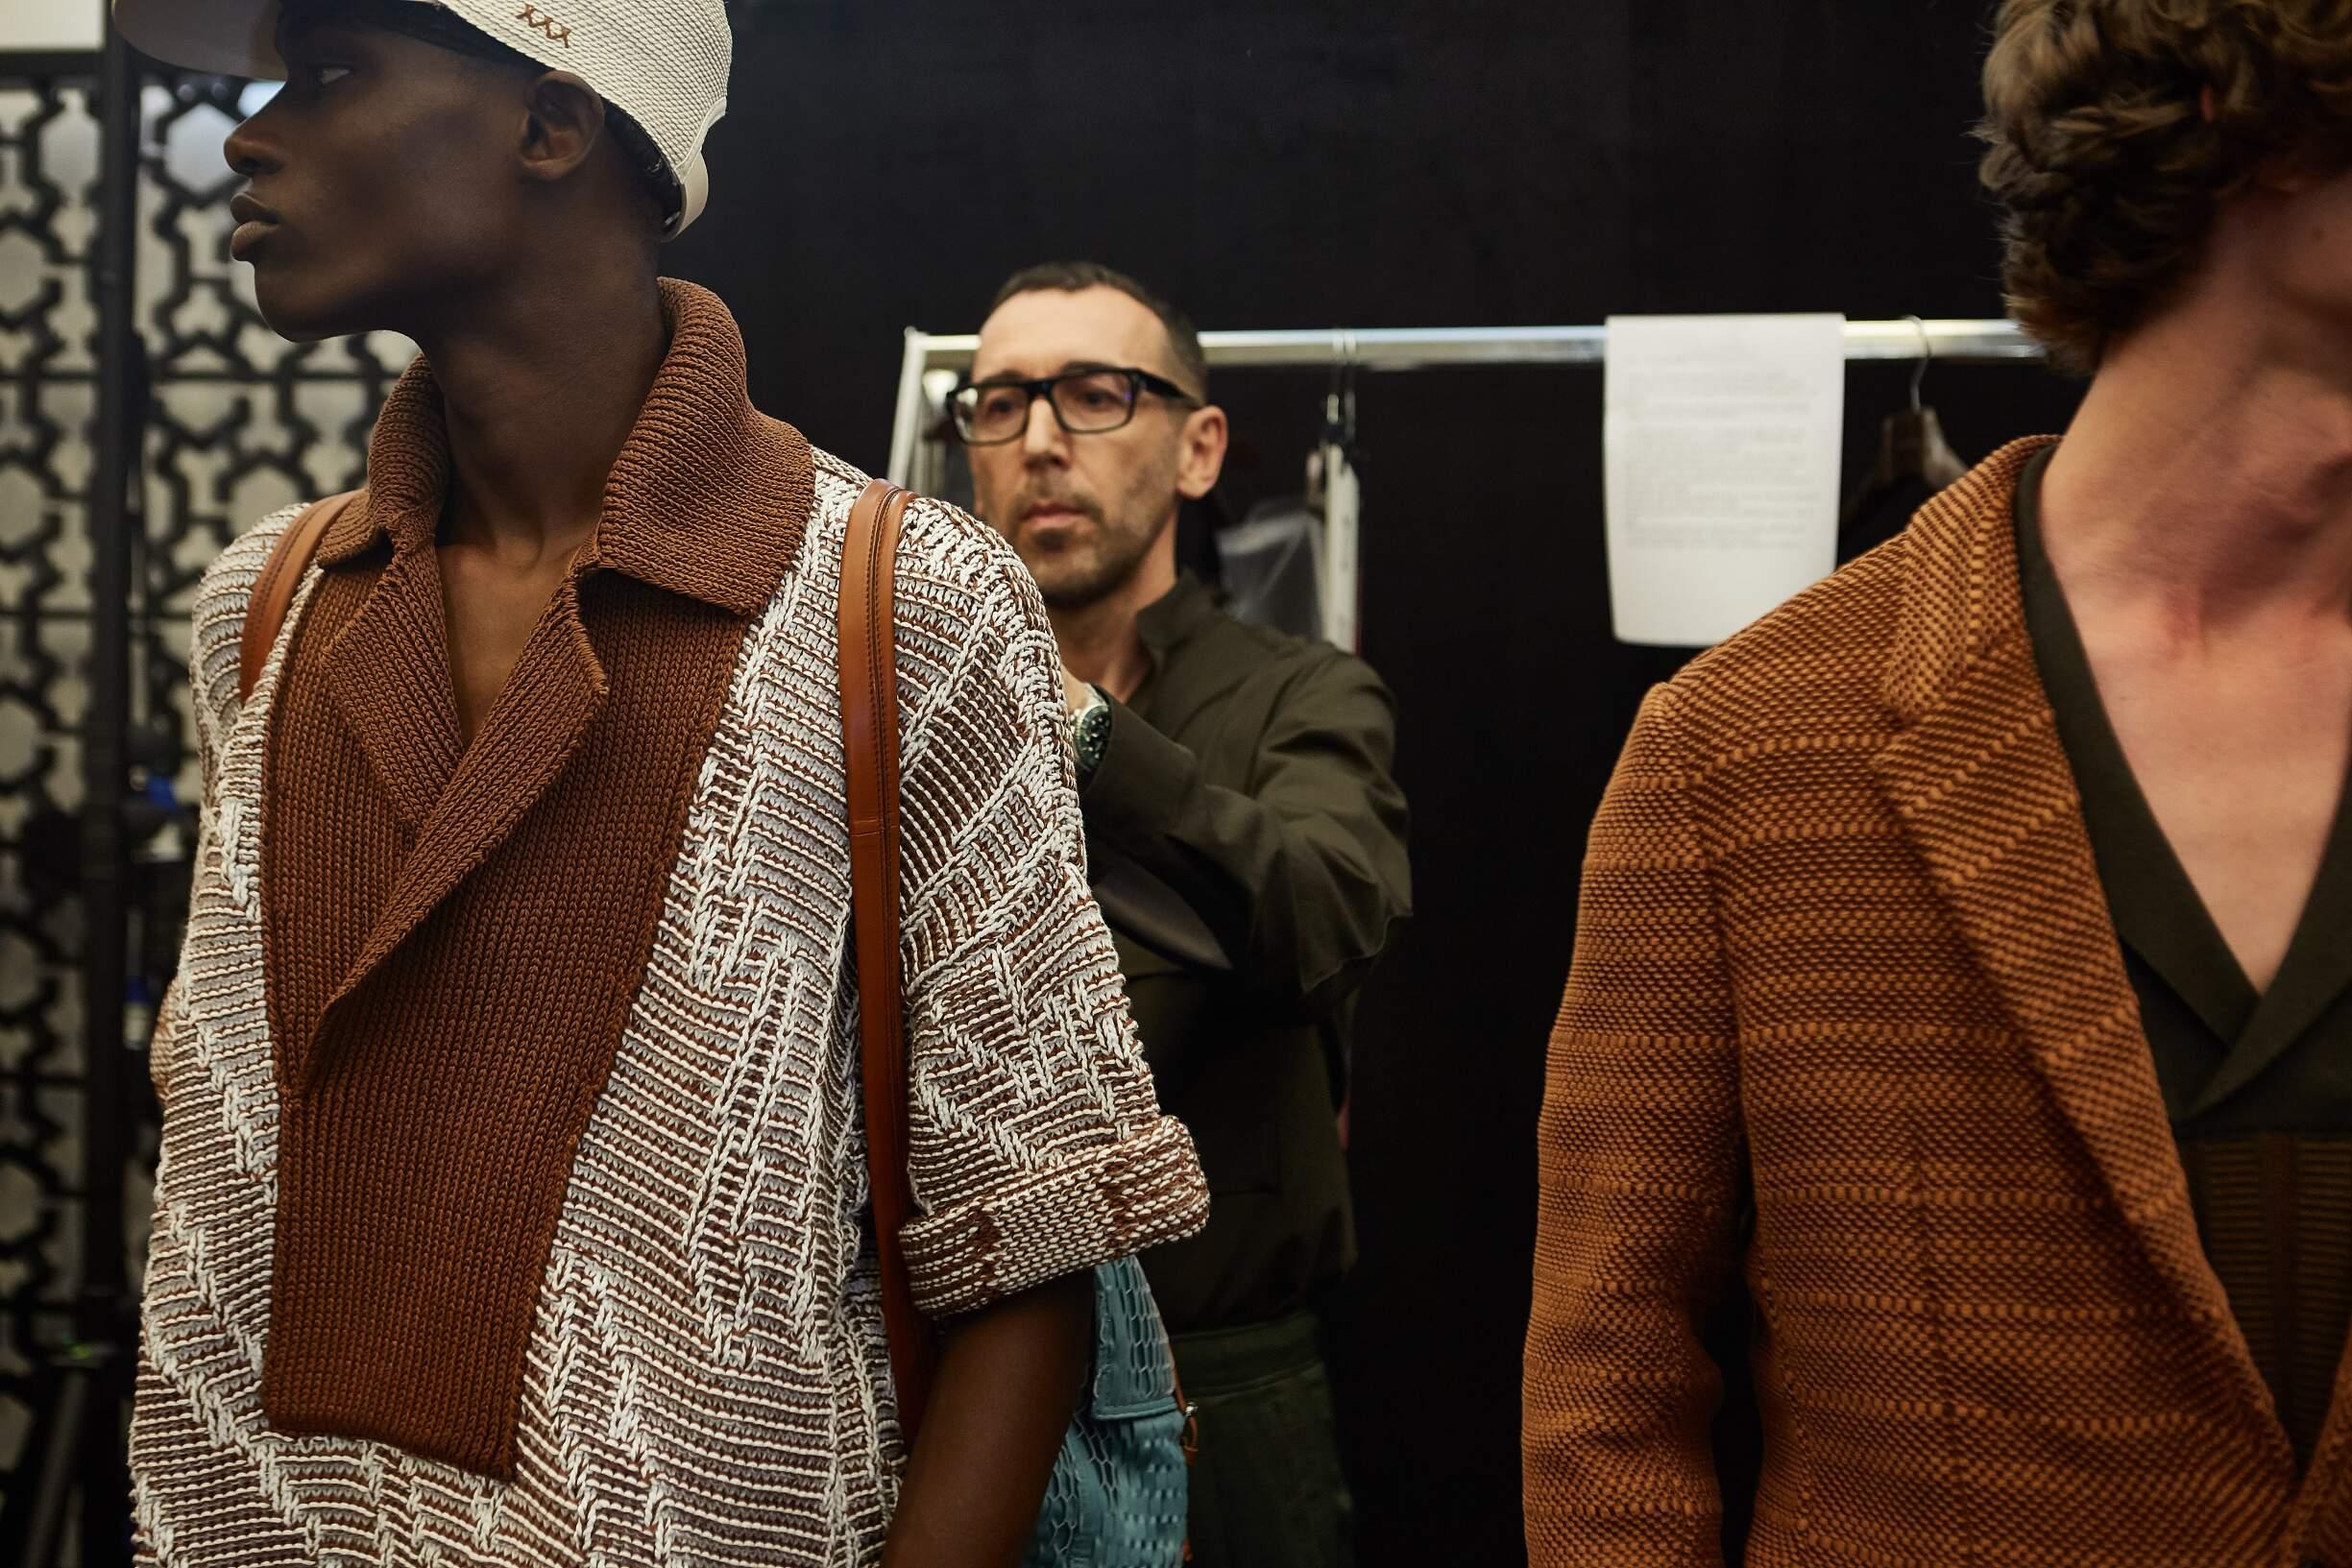 Backstage Ermenegildo Zegna Couture Alessandro Sartori 2018